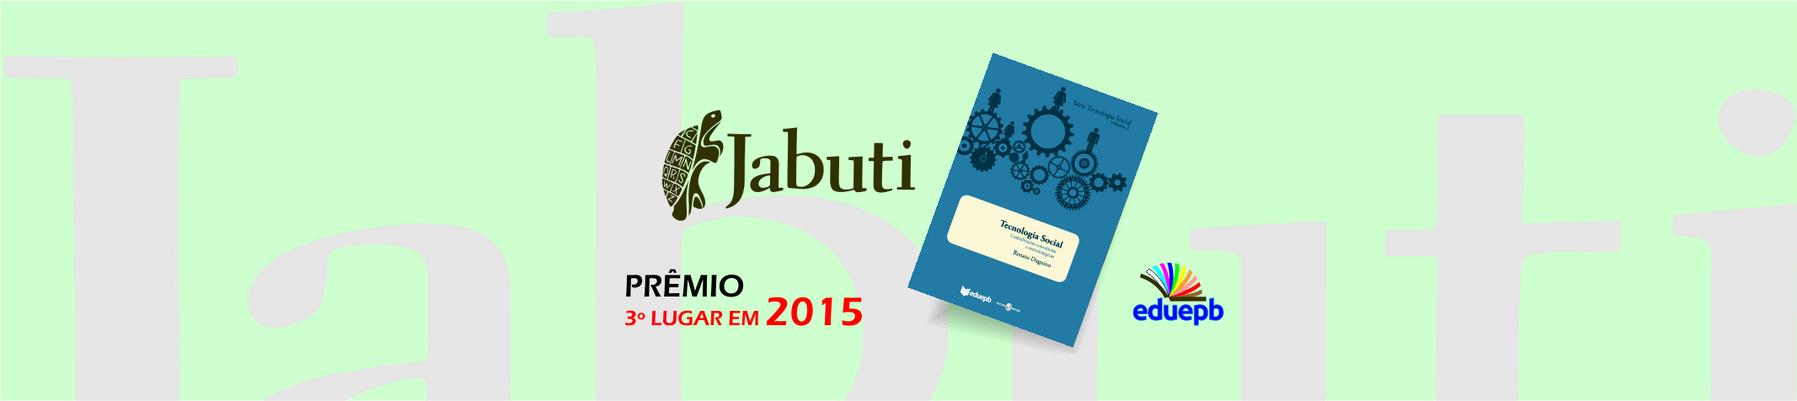 JABUTI 4.png